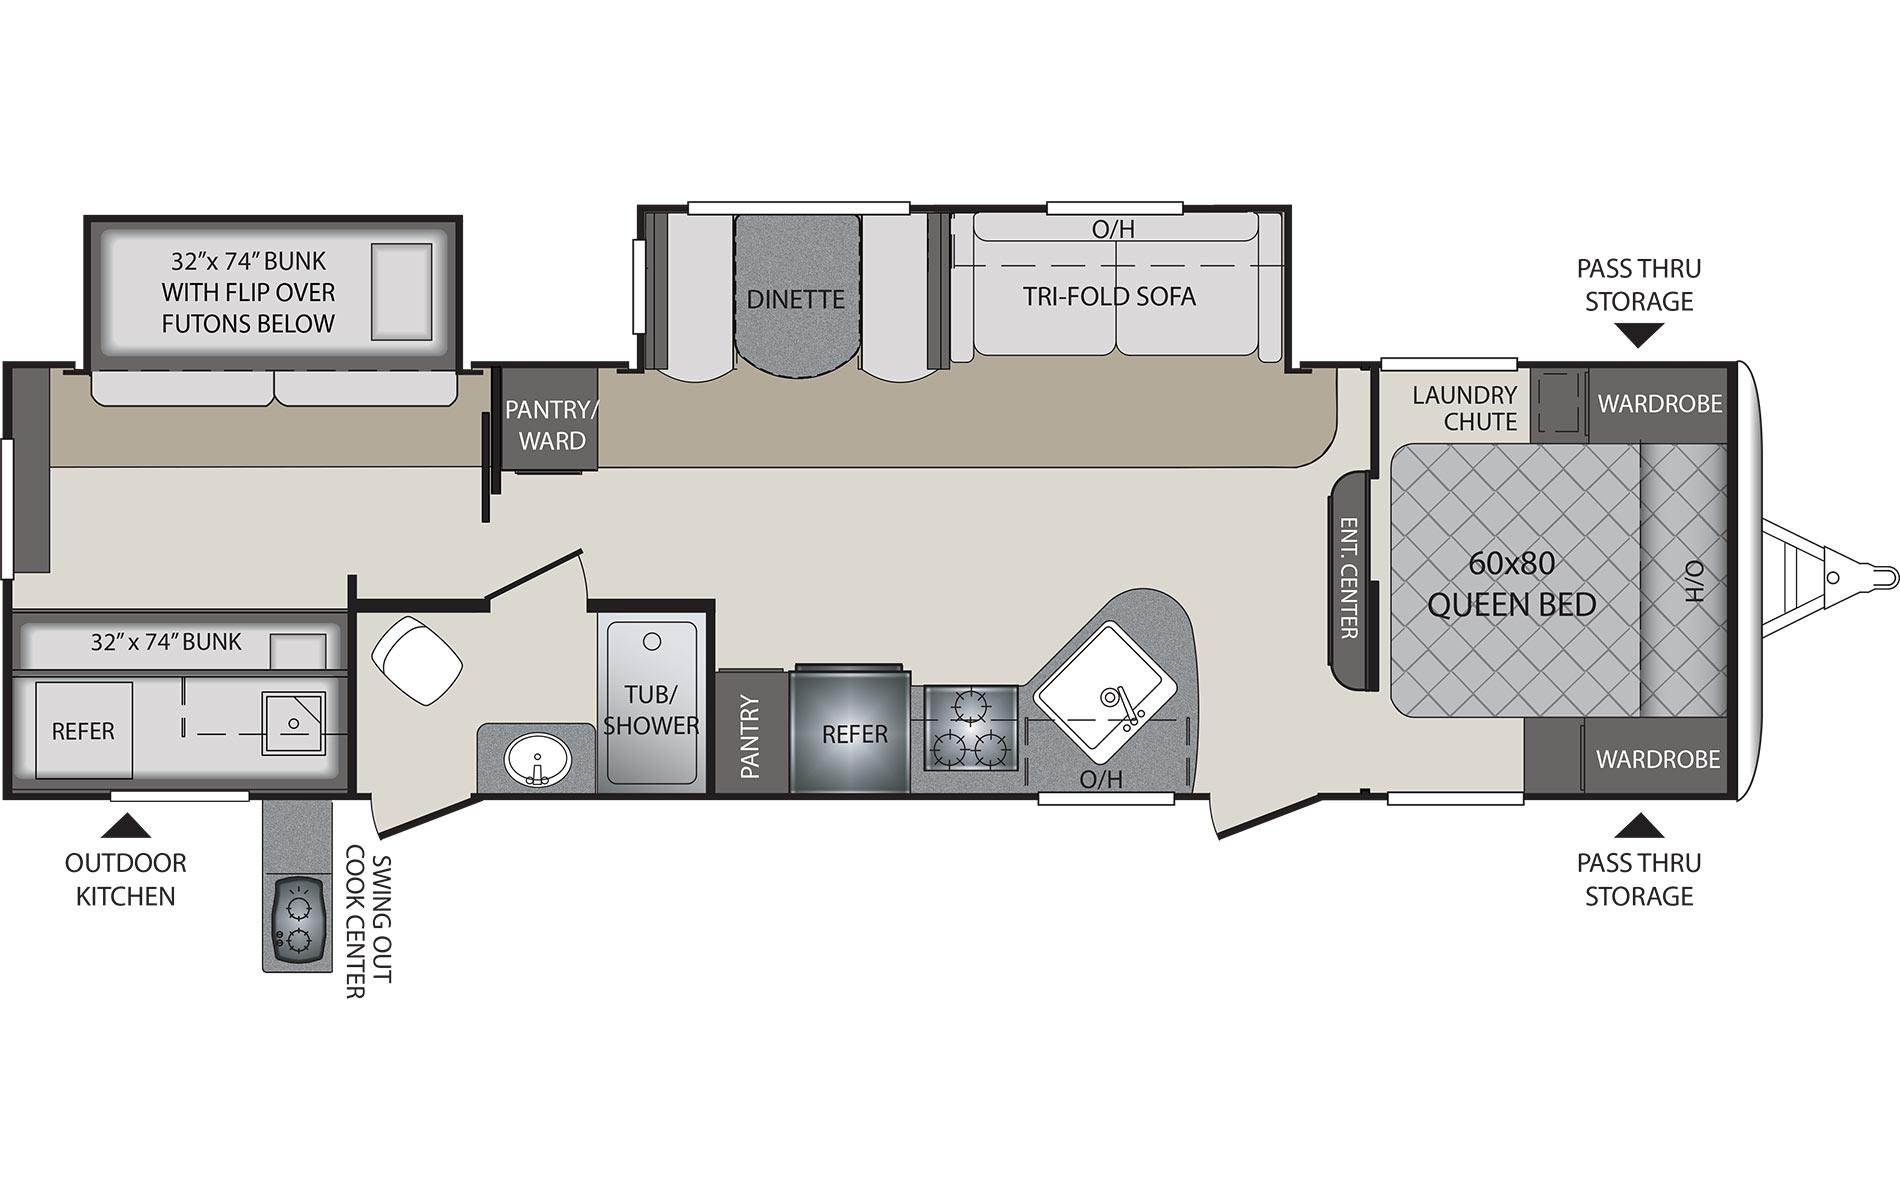 2016 KEYSTONE RV PREMIER 31BHPR (bunks) Floorplan